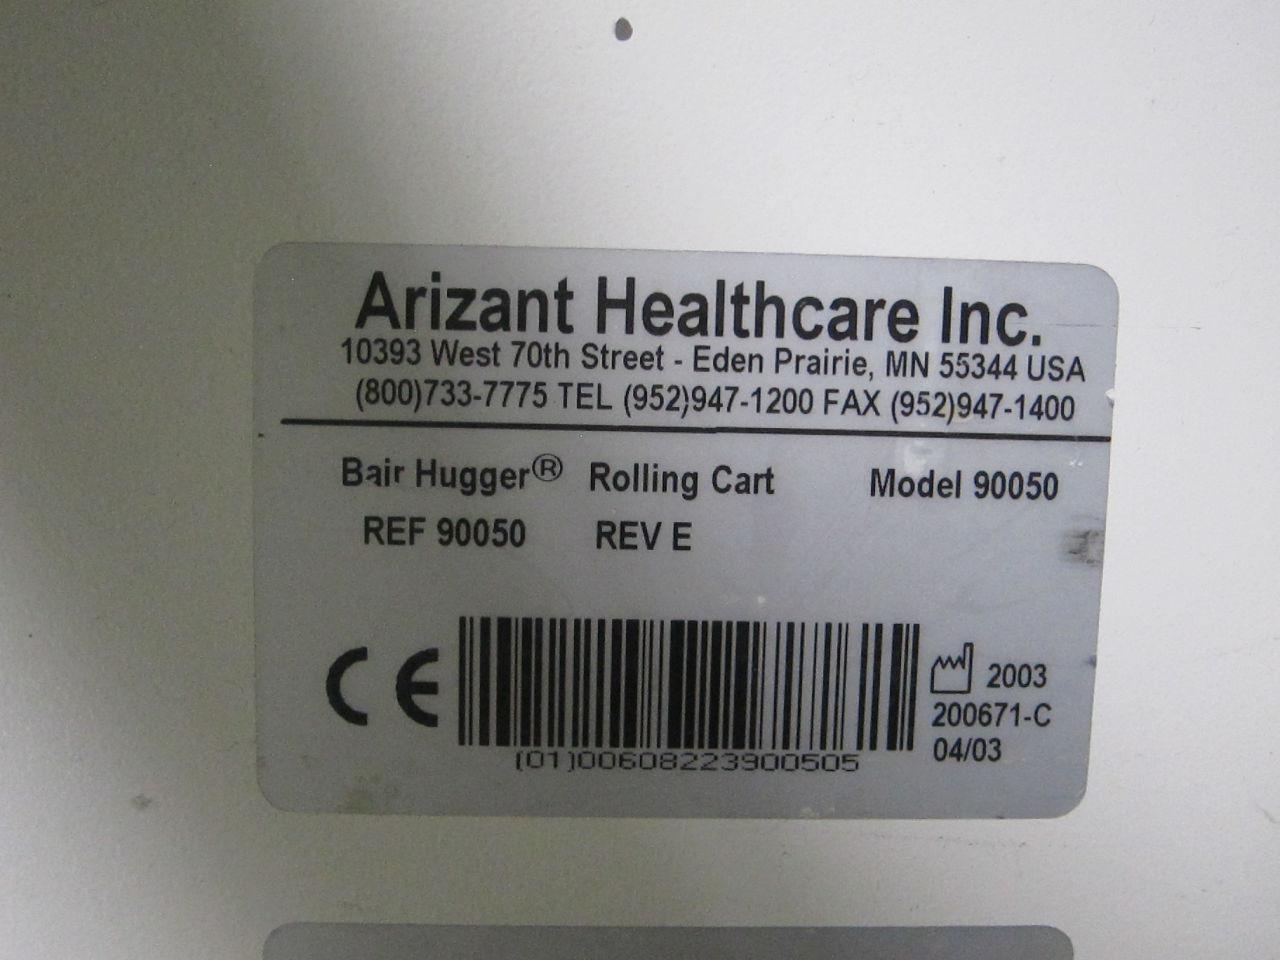 ARIZANT HEALTHCARE Bair Hugger 90050 Rolling Cart